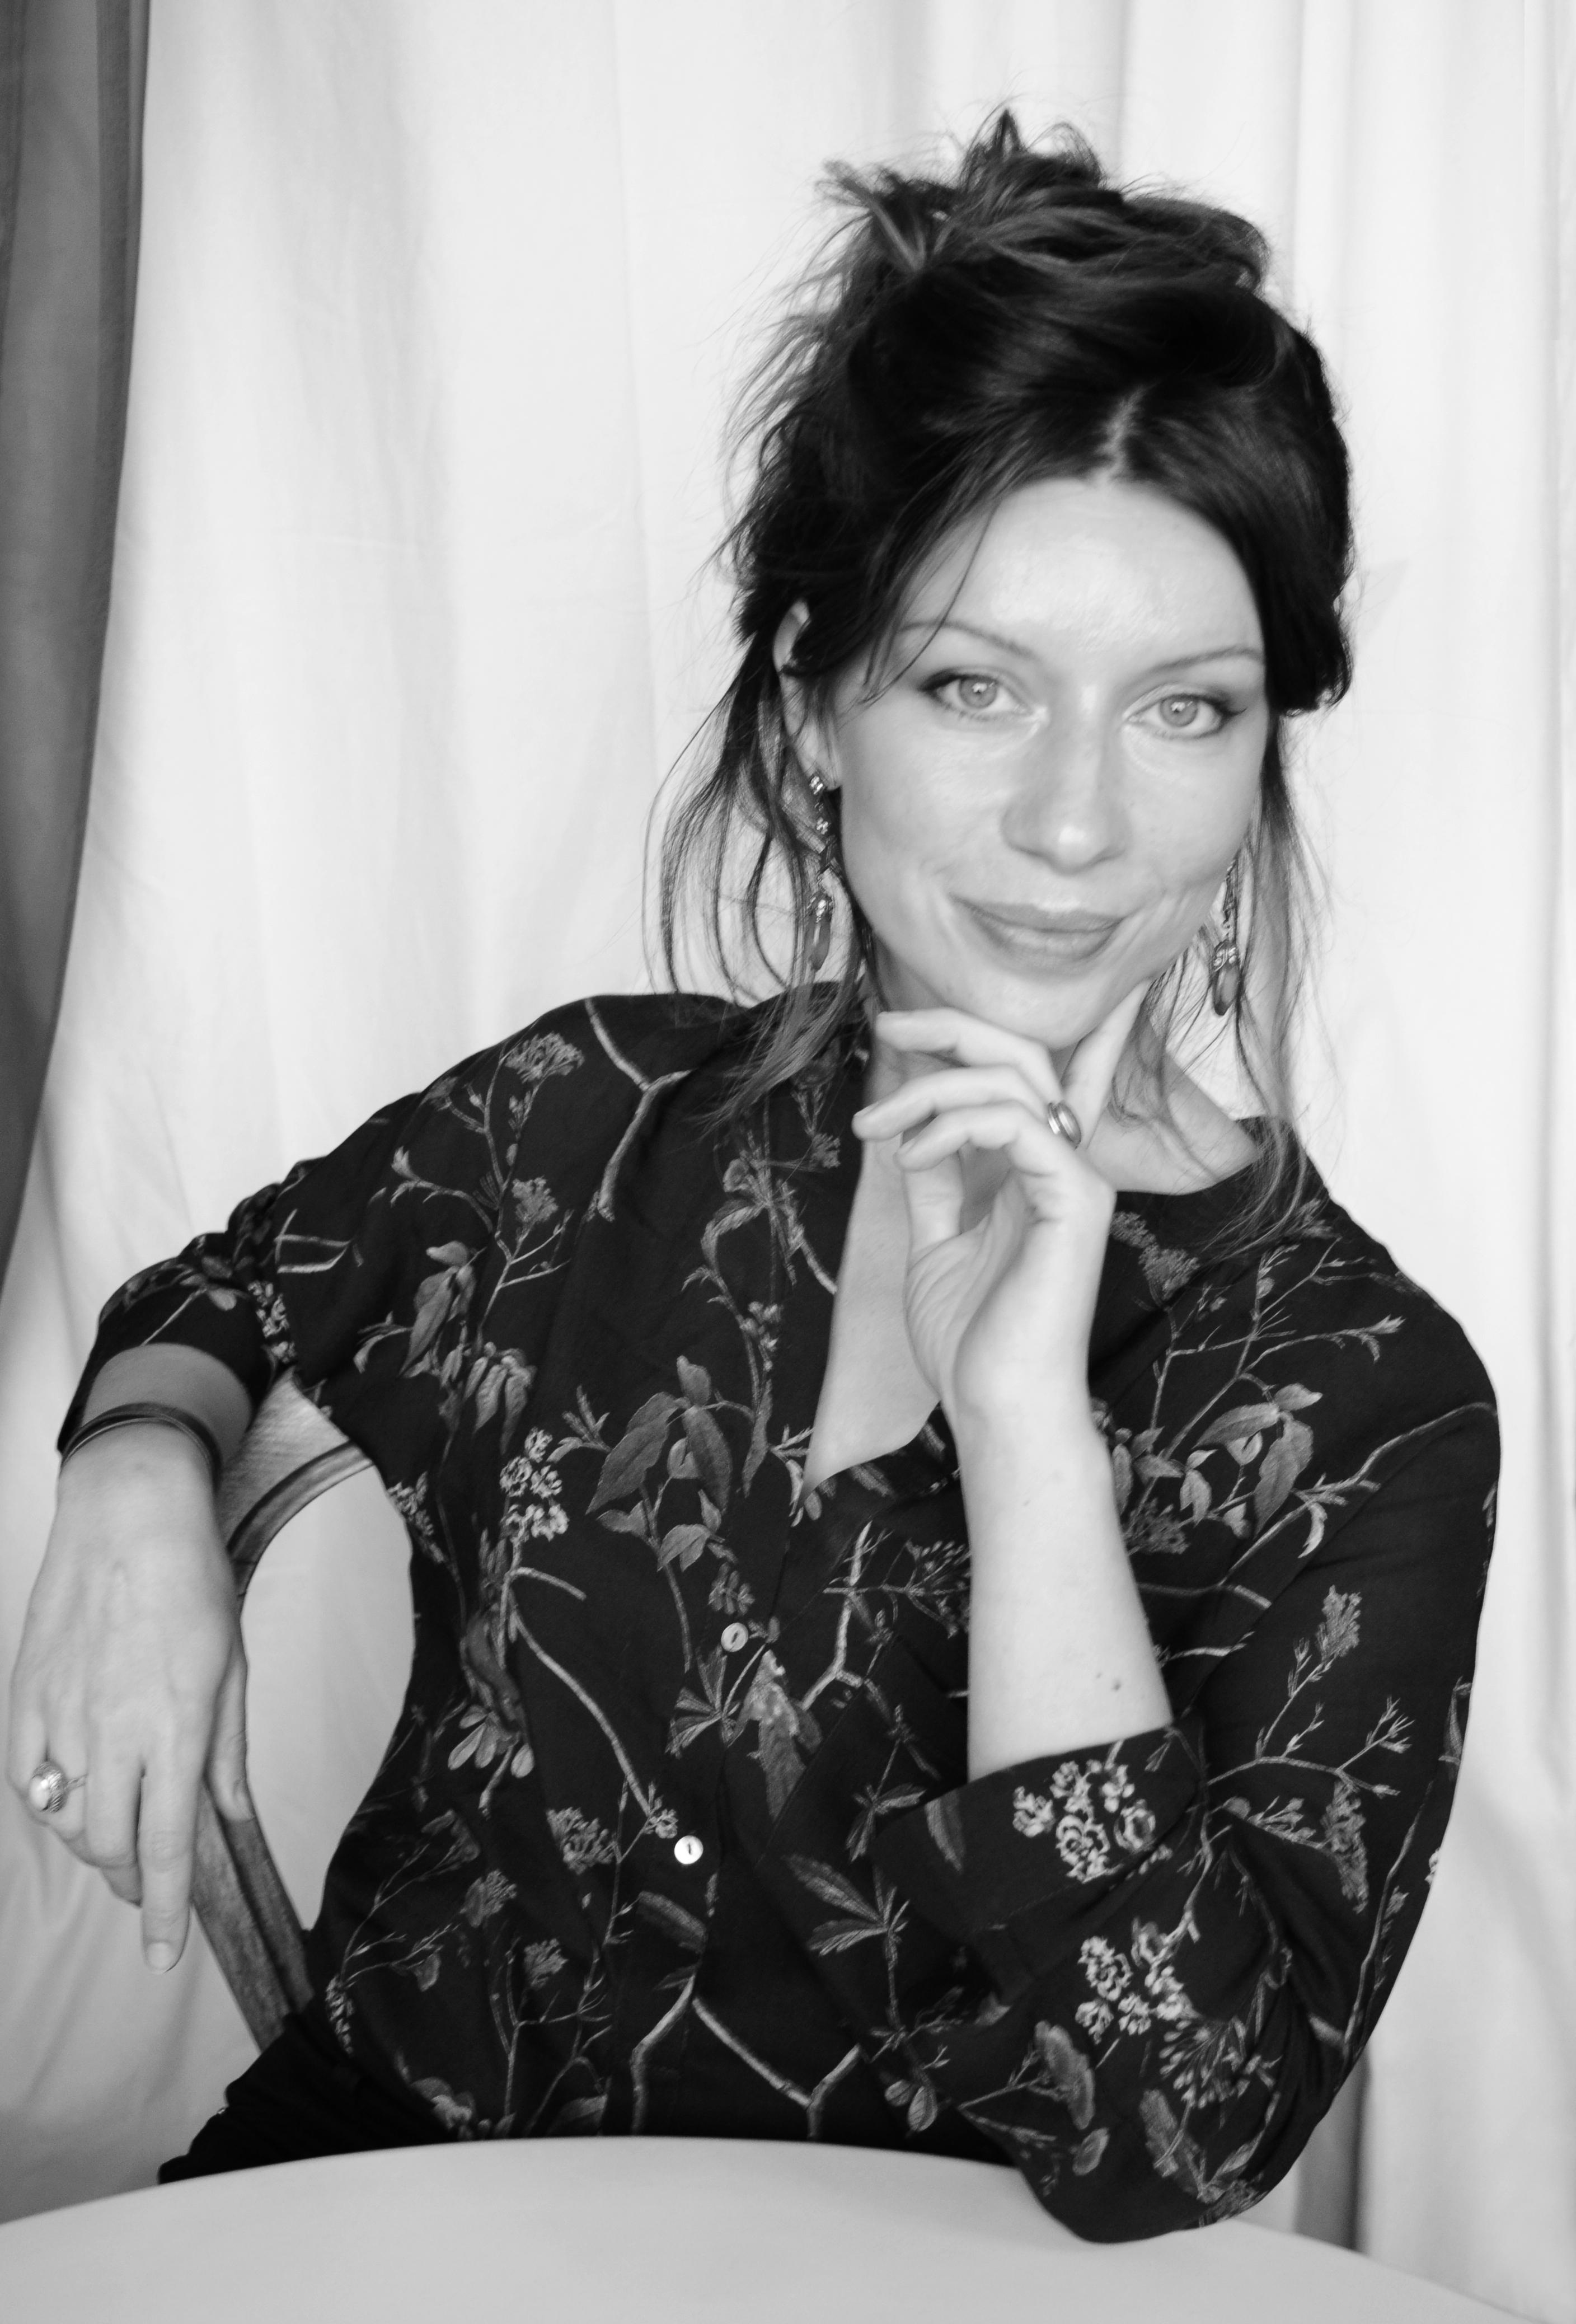 Héloïse Cardi, fondatrice et directrice artistique de la maison Arteslonga